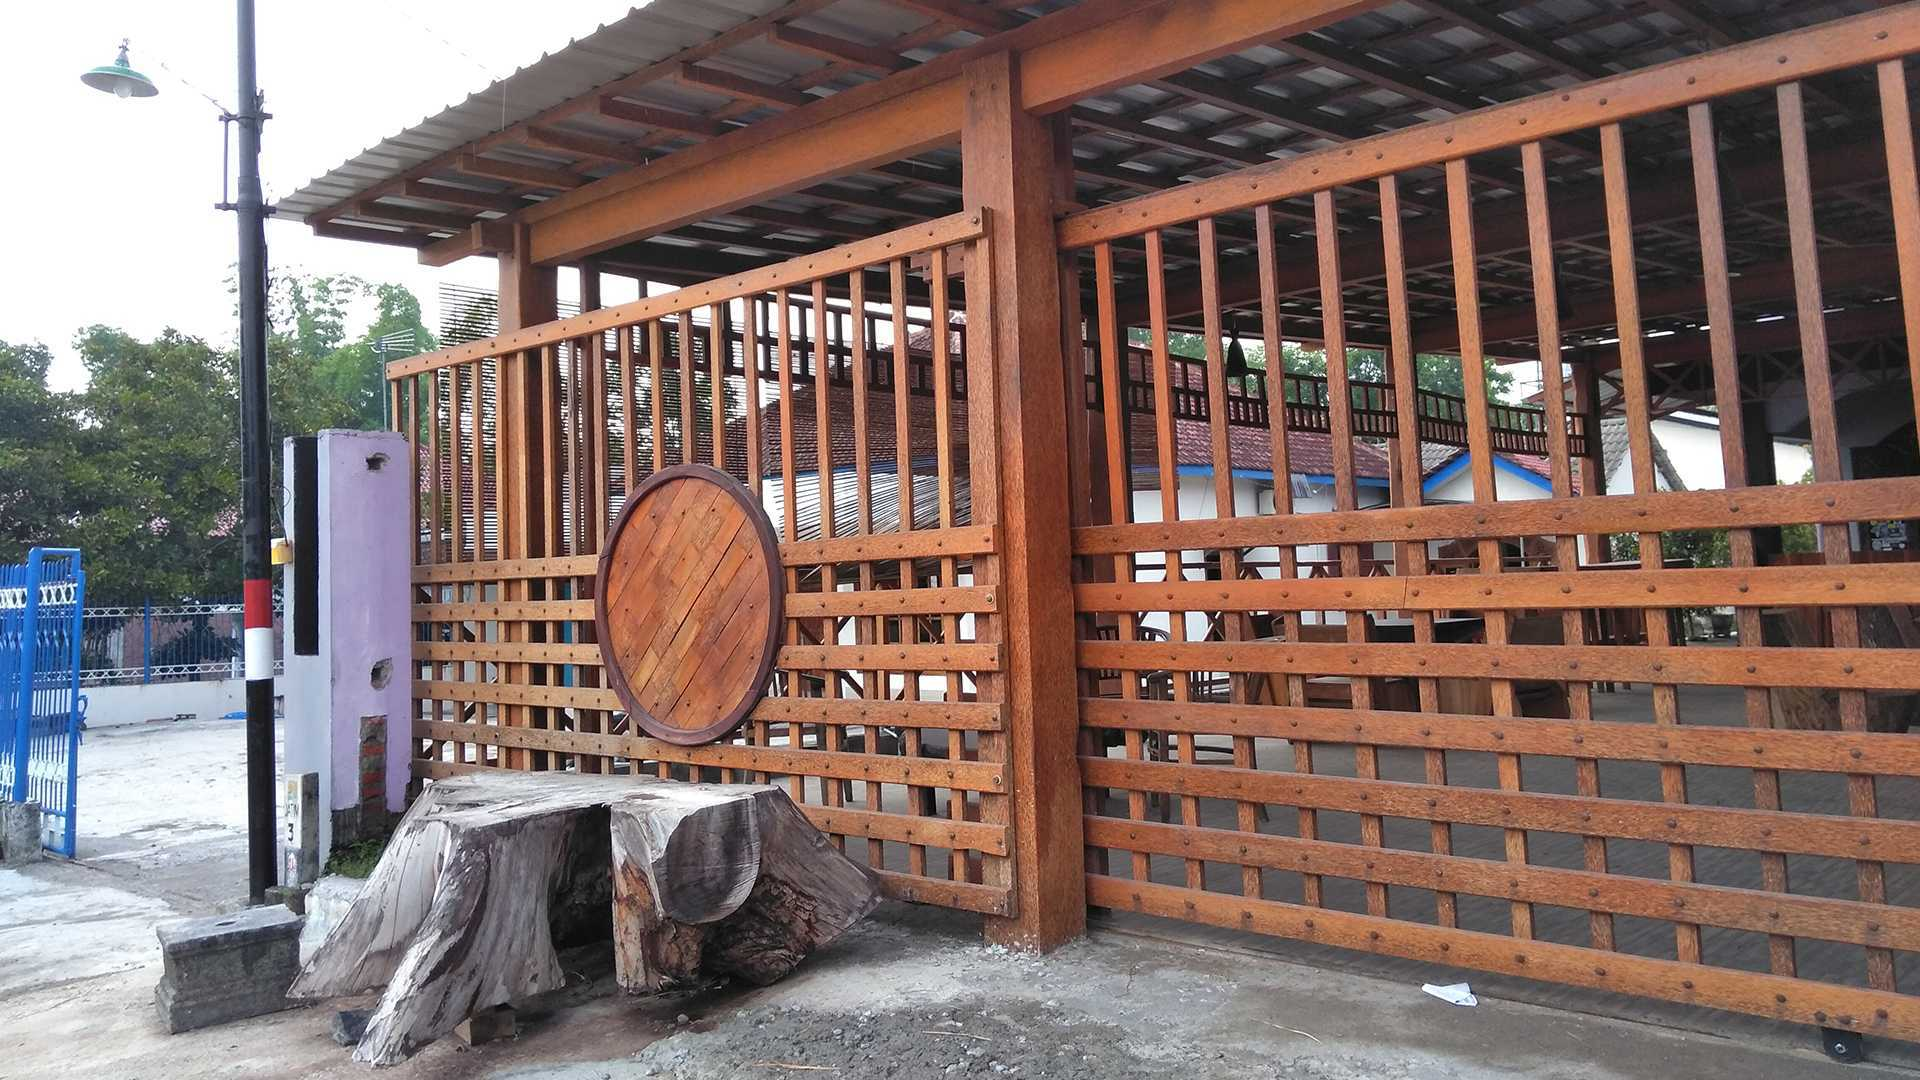 Epicnesia_Architect Warung Mbok Ti Malang, Jawa Timur, Indonesia Kediri, Jawa Timur, Indonesia Aditya-Yuni-Prasetya-Bakso-Tiga-Berlian   64299